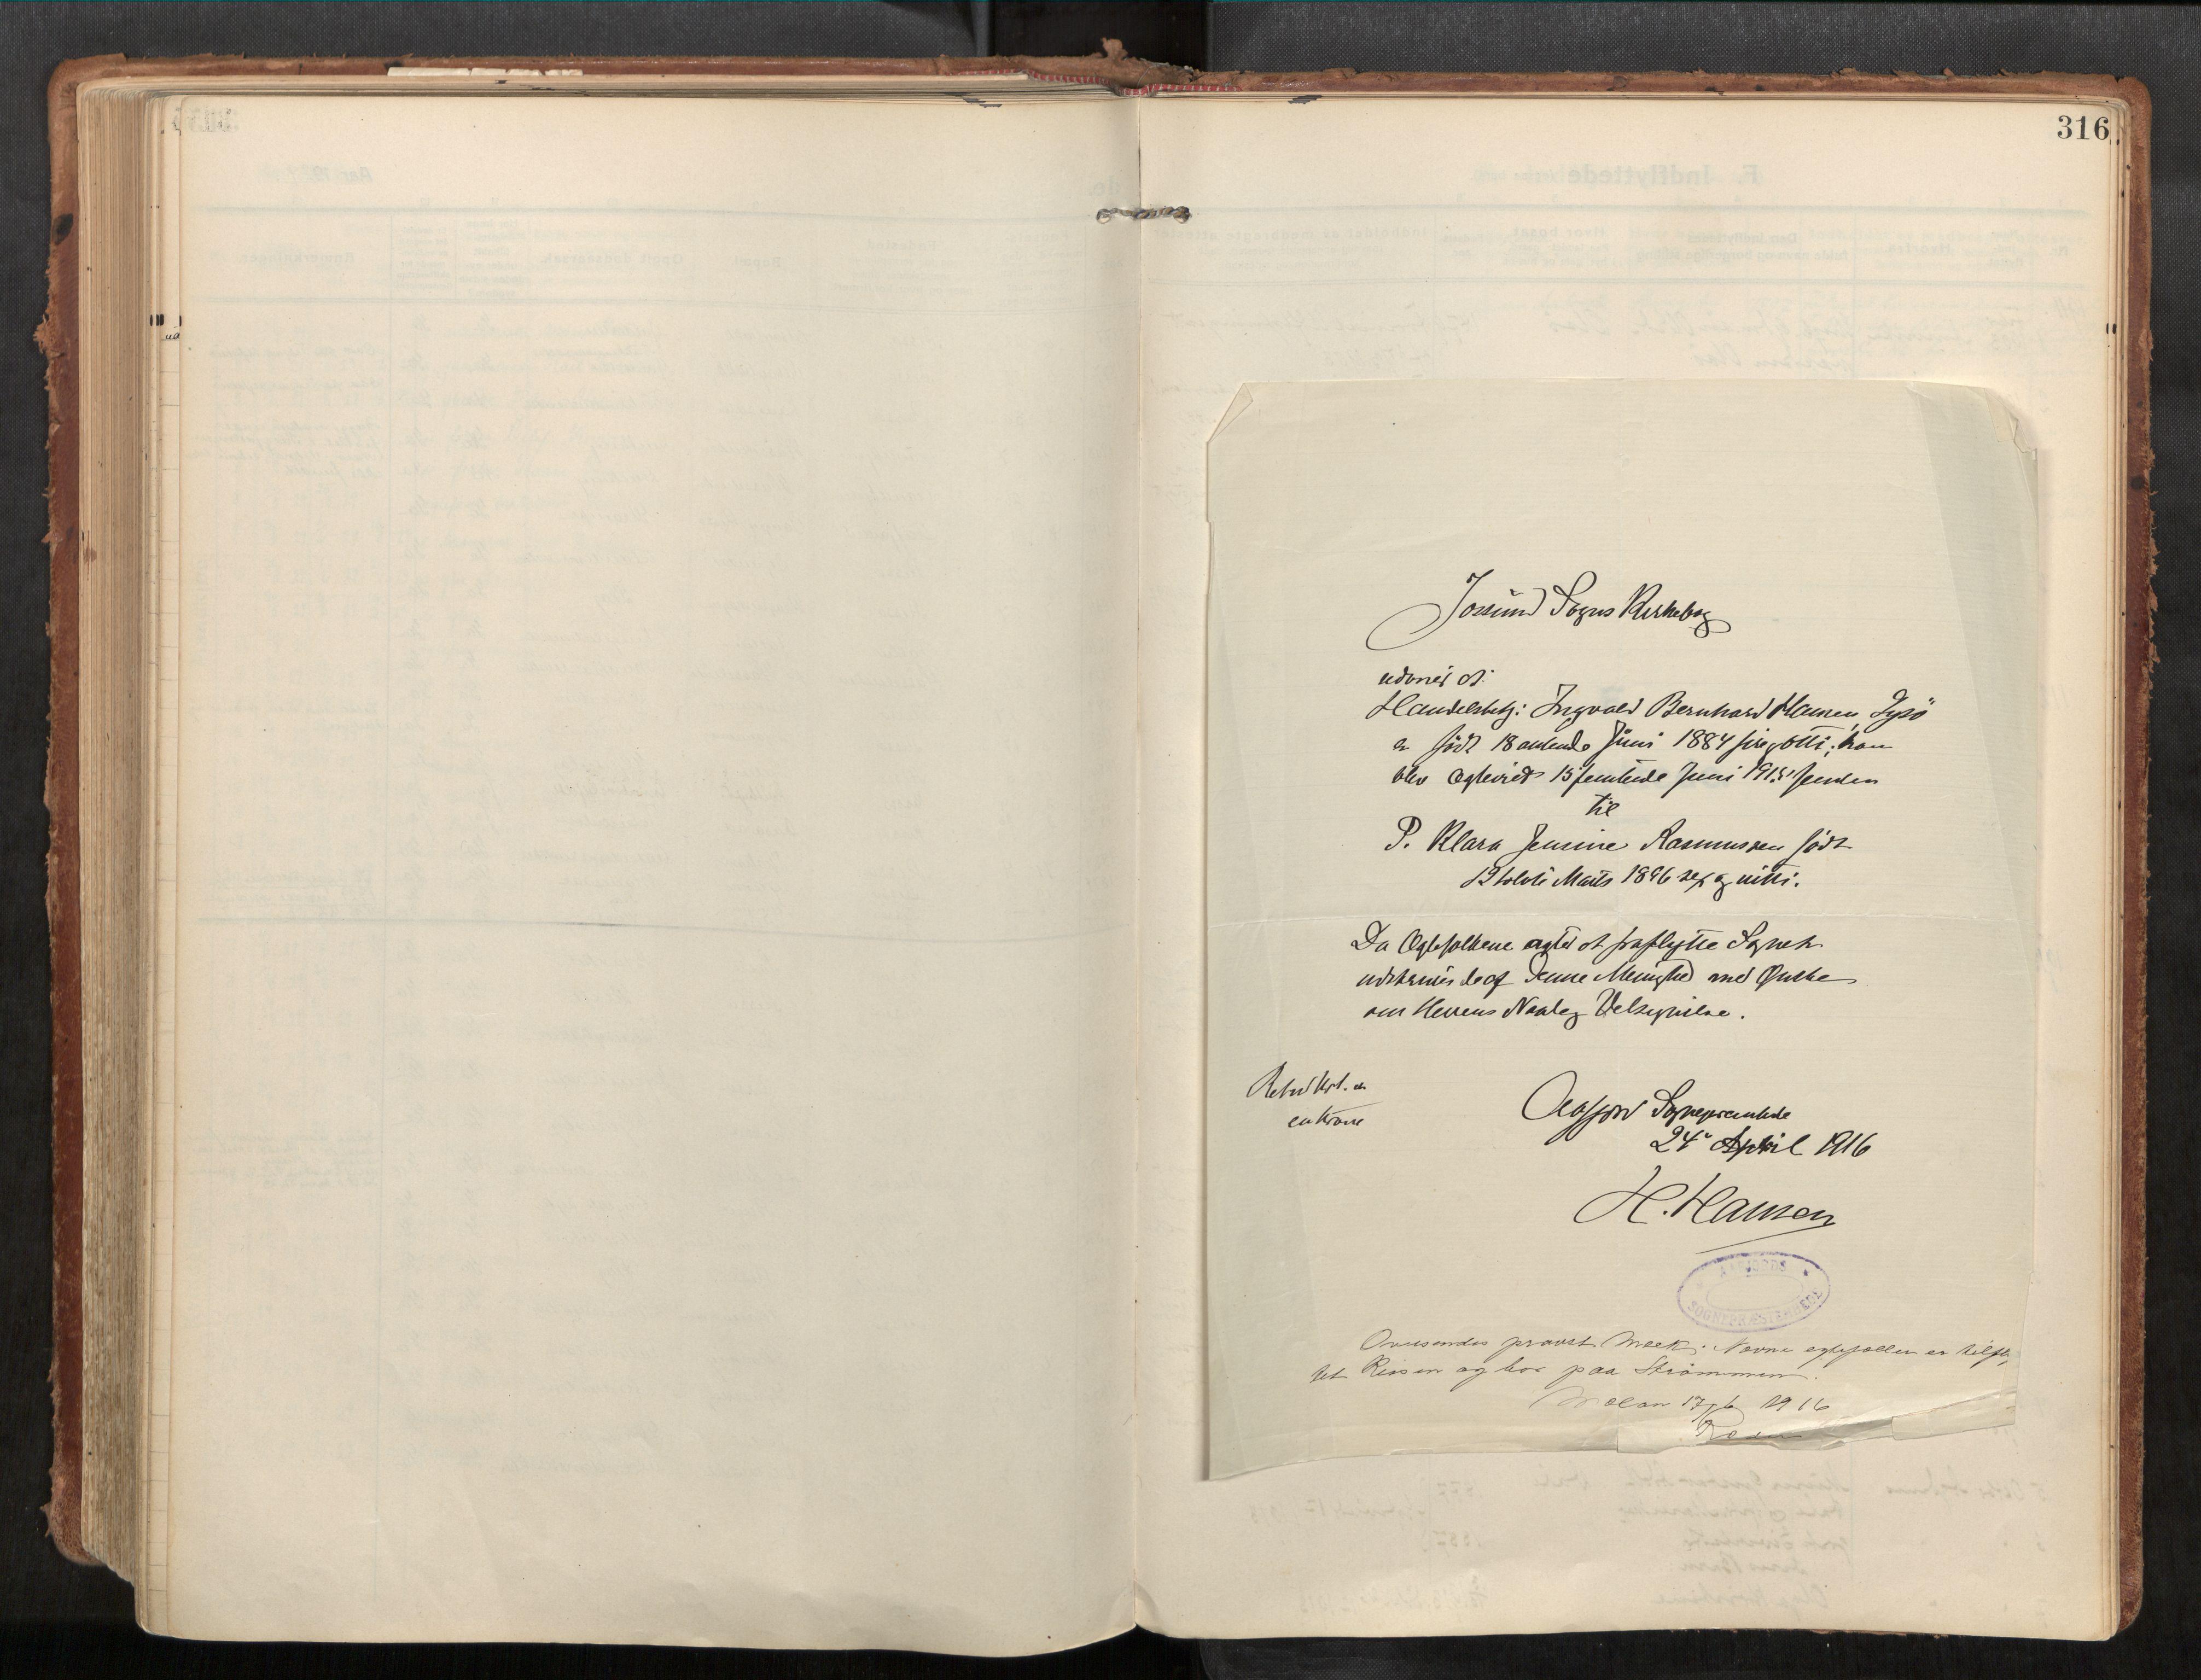 SAT, Stadsbygd sokneprestkontor, I/I1/I1a/L0001: Parish register (official) no. 1, 1911-1929